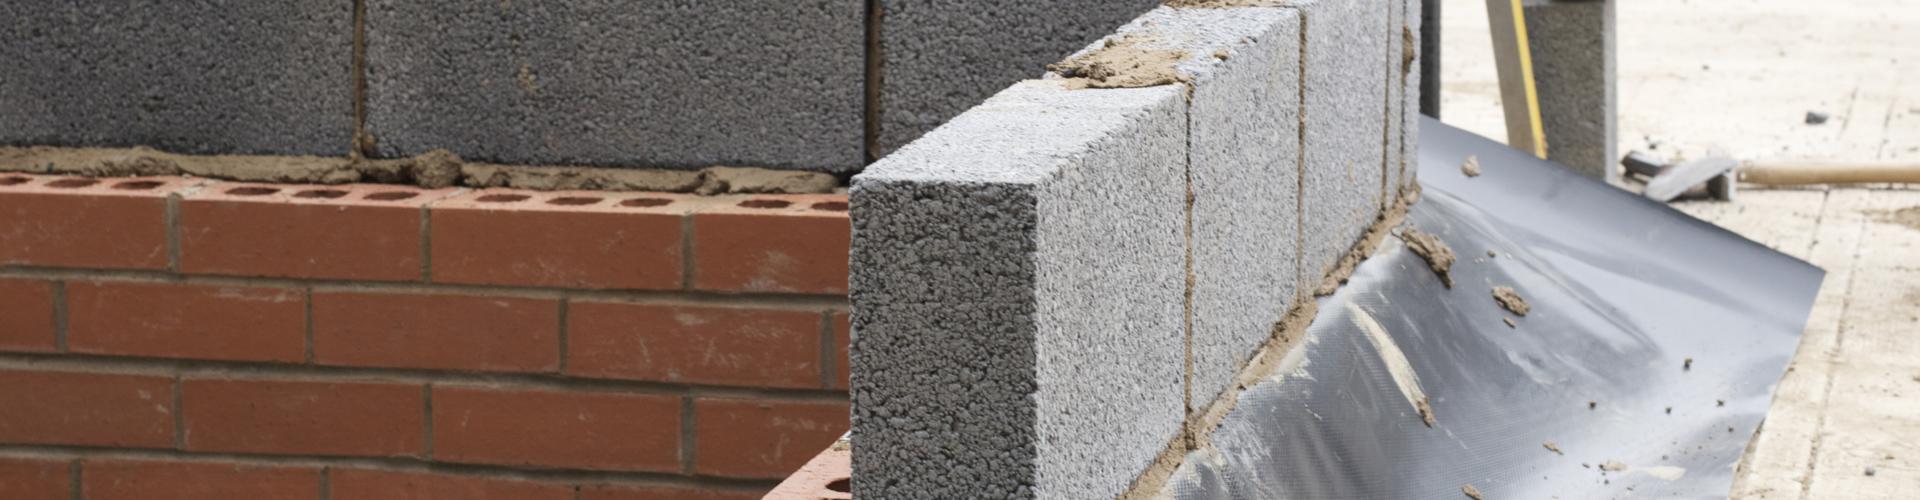 http://reidjames.co.uk/wp-content/uploads/2016/02/services_brickwork.jpg